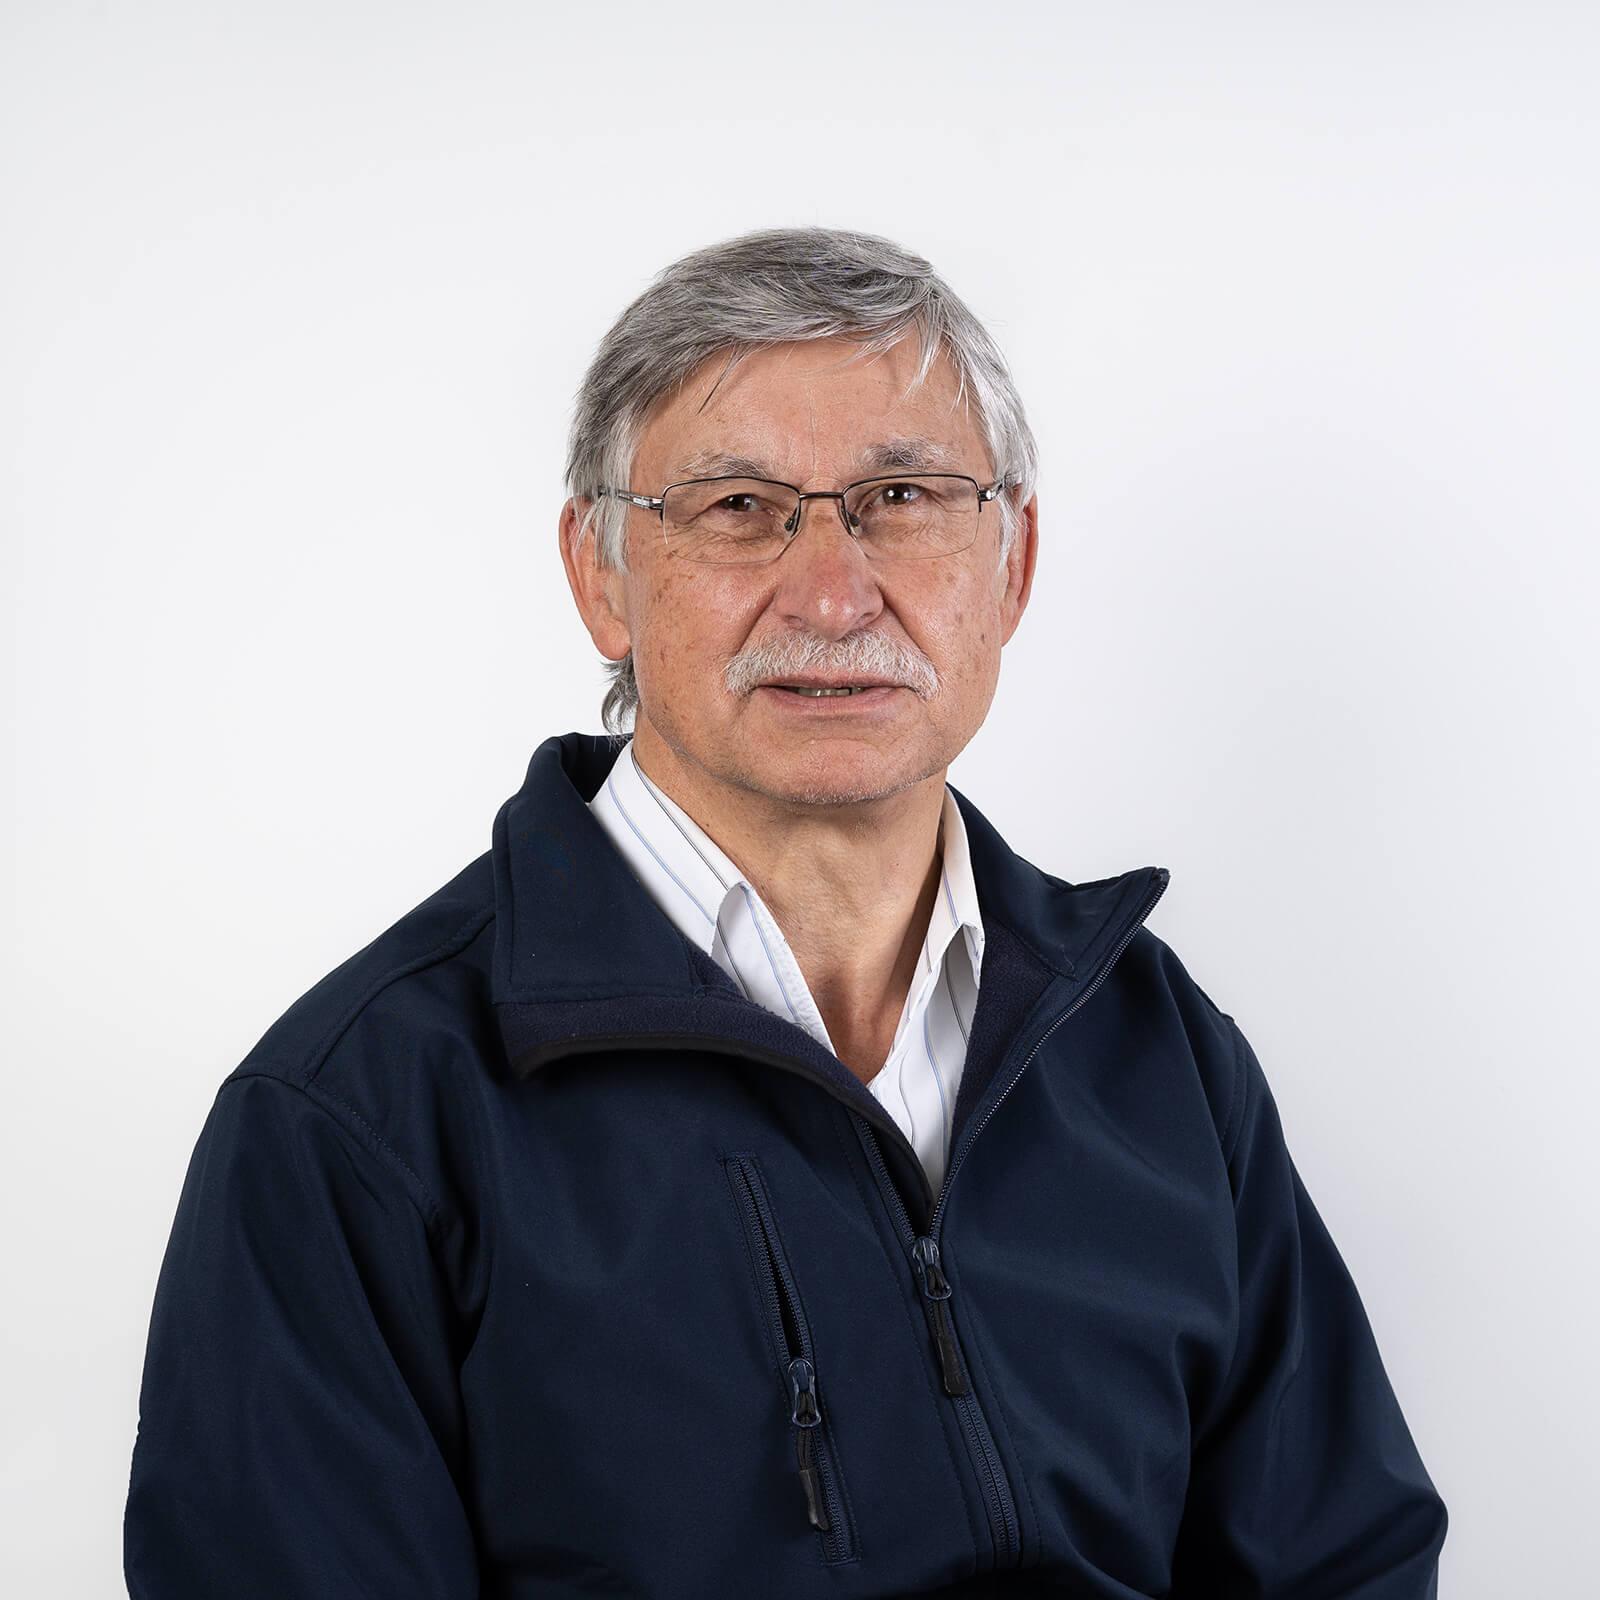 Herr Gerhard Lösel